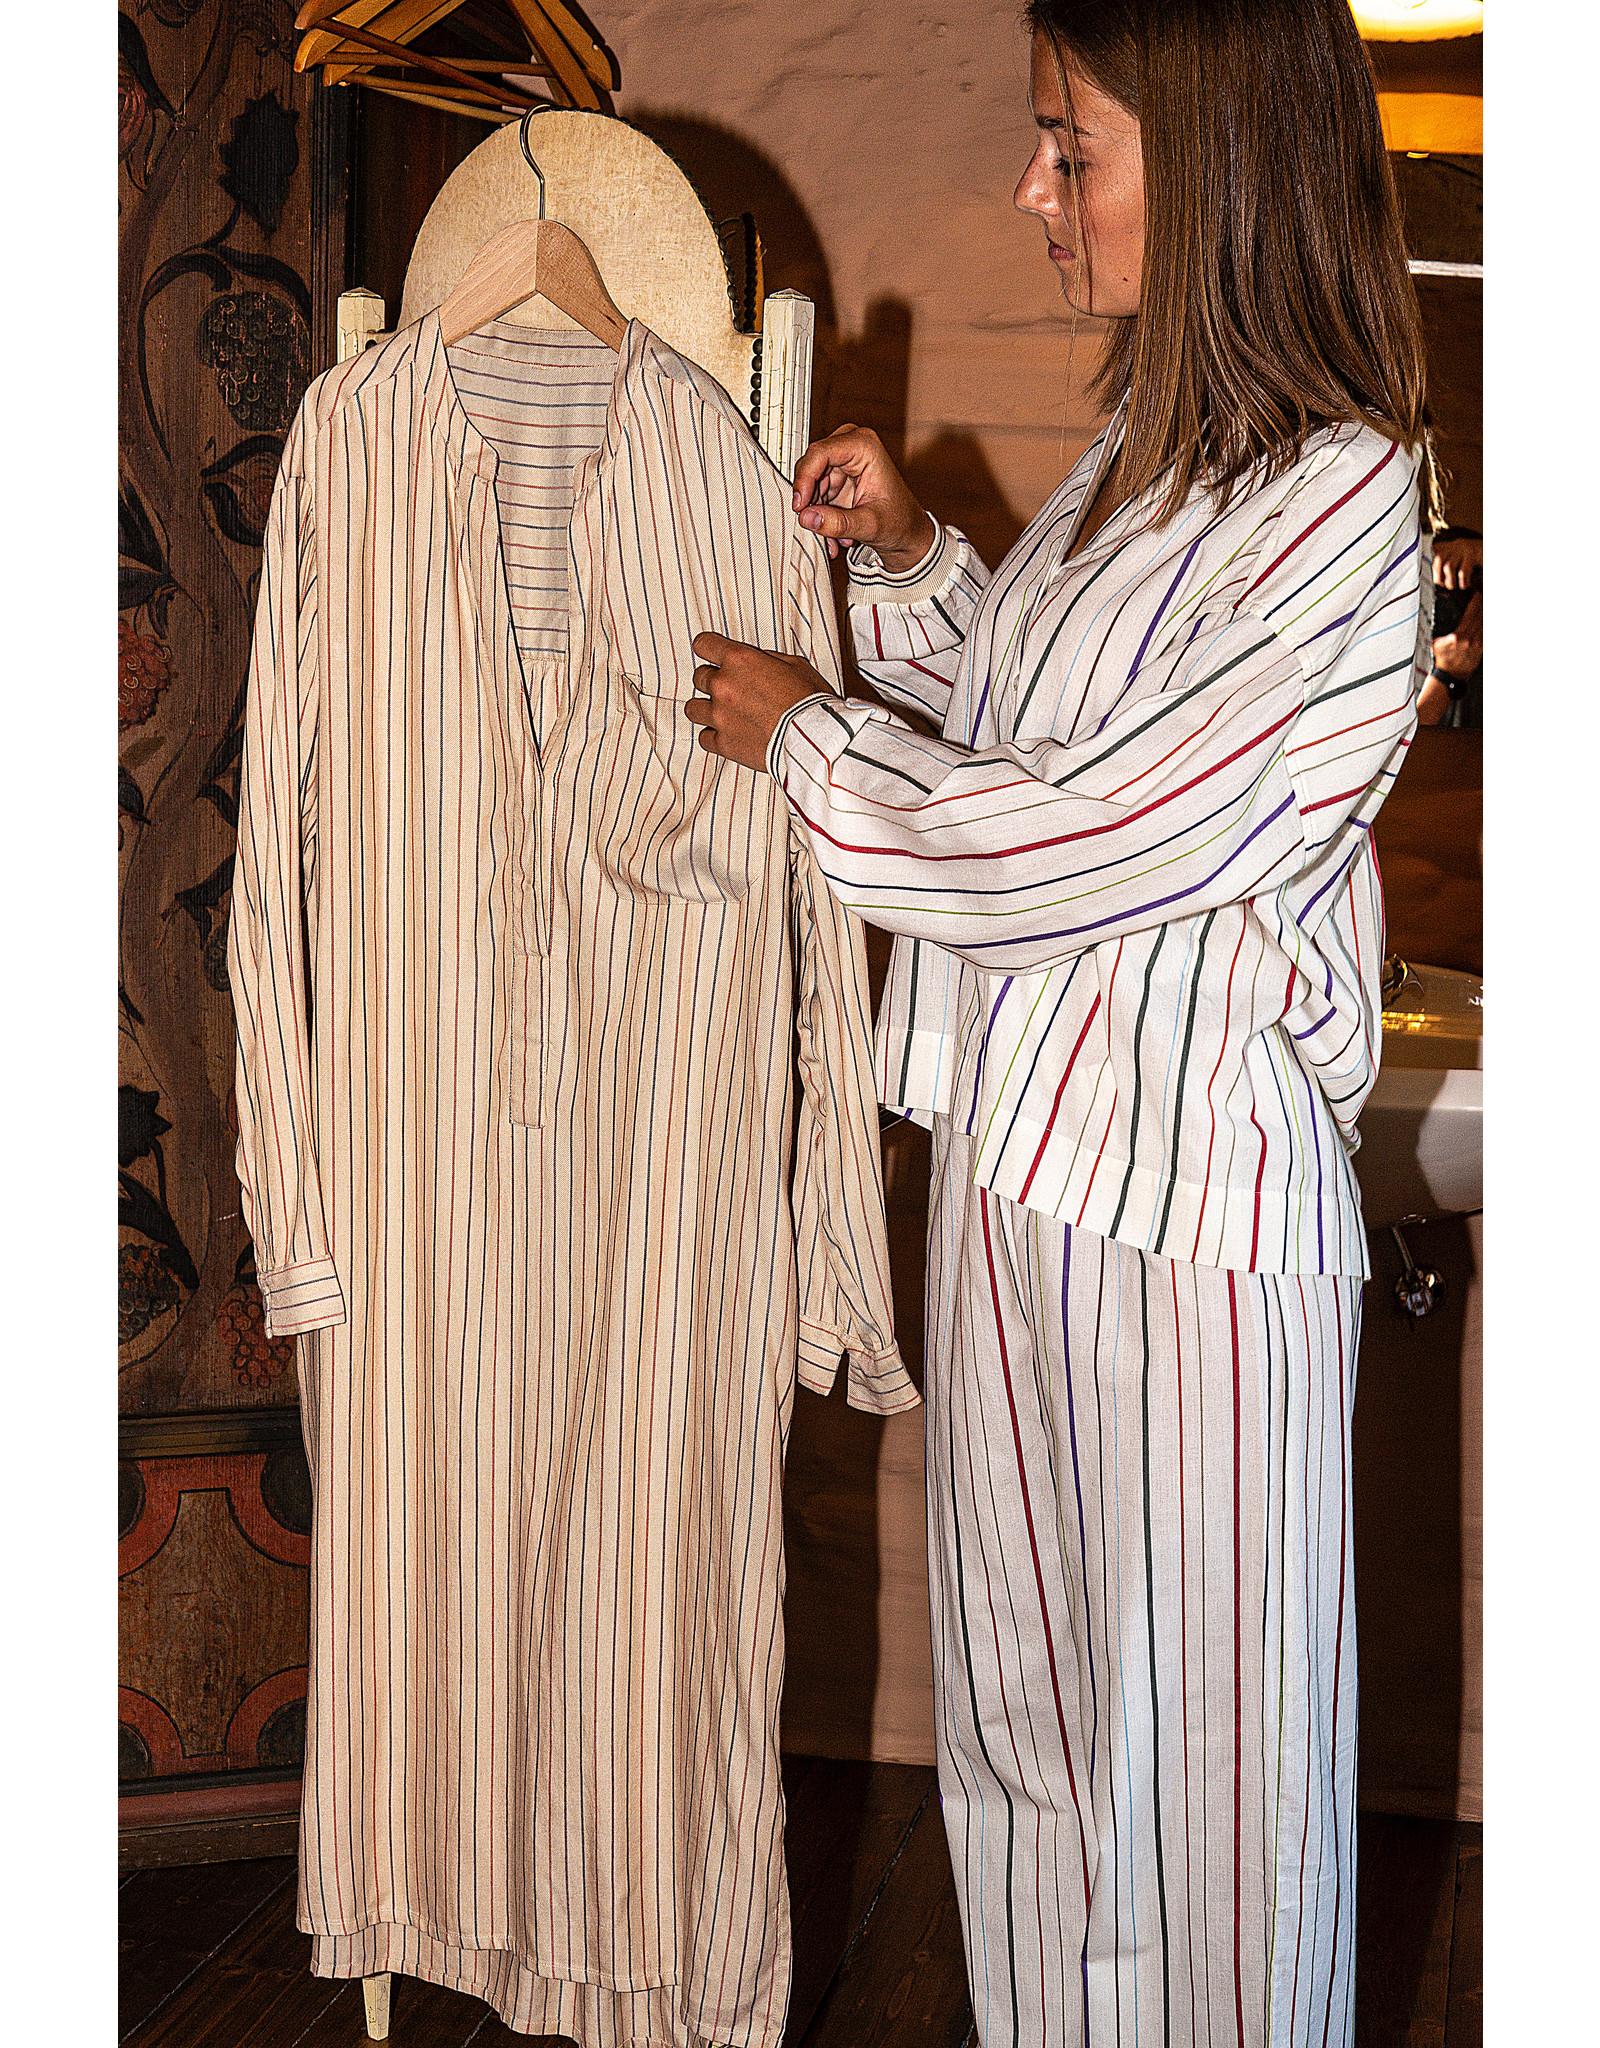 Dorélit Diane + Alkes | Pajama Set Woven | Stripe Multi